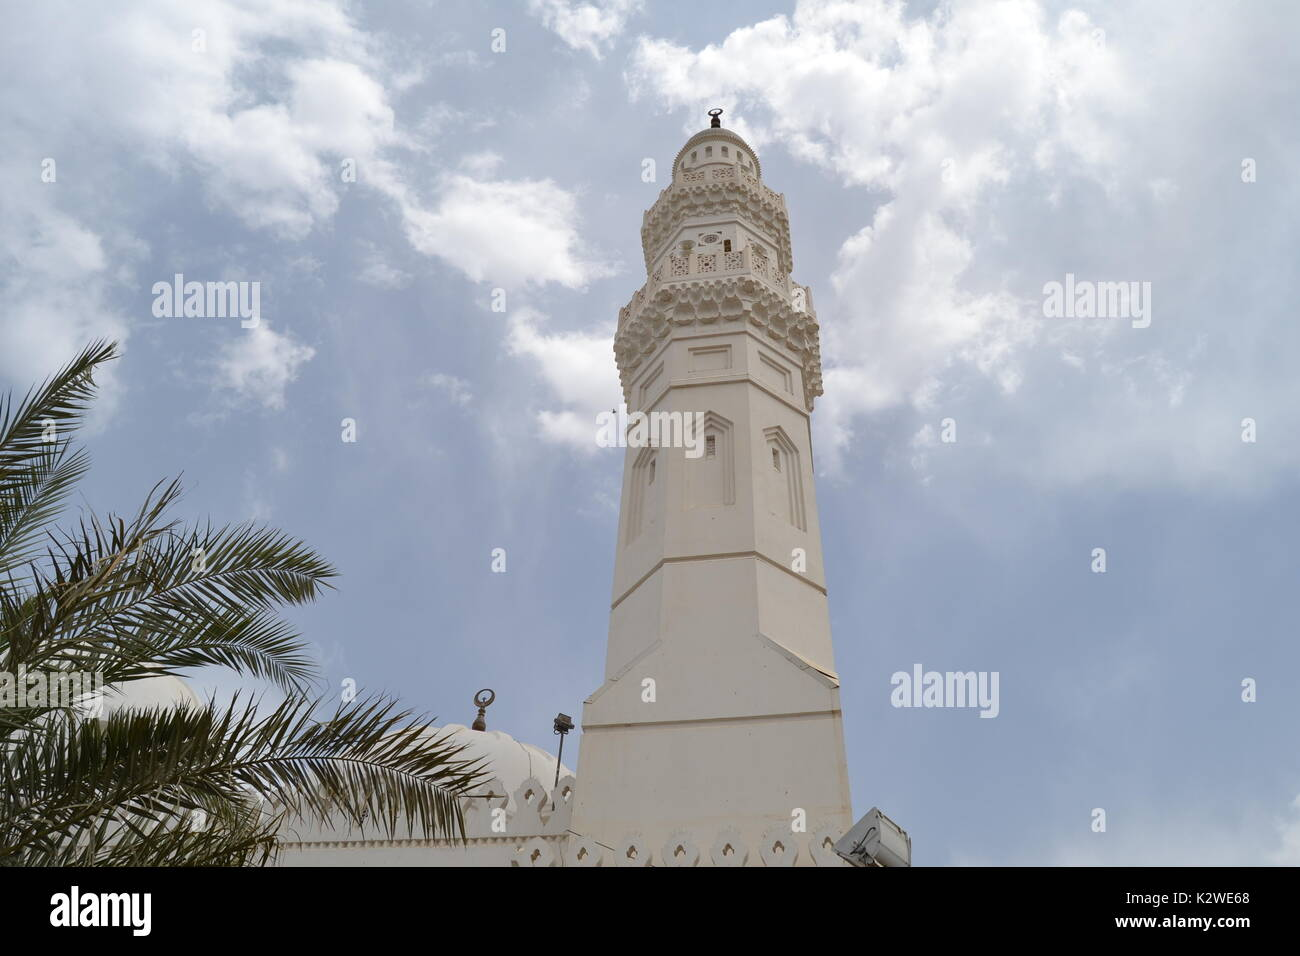 Masjid Quba - Stock Image